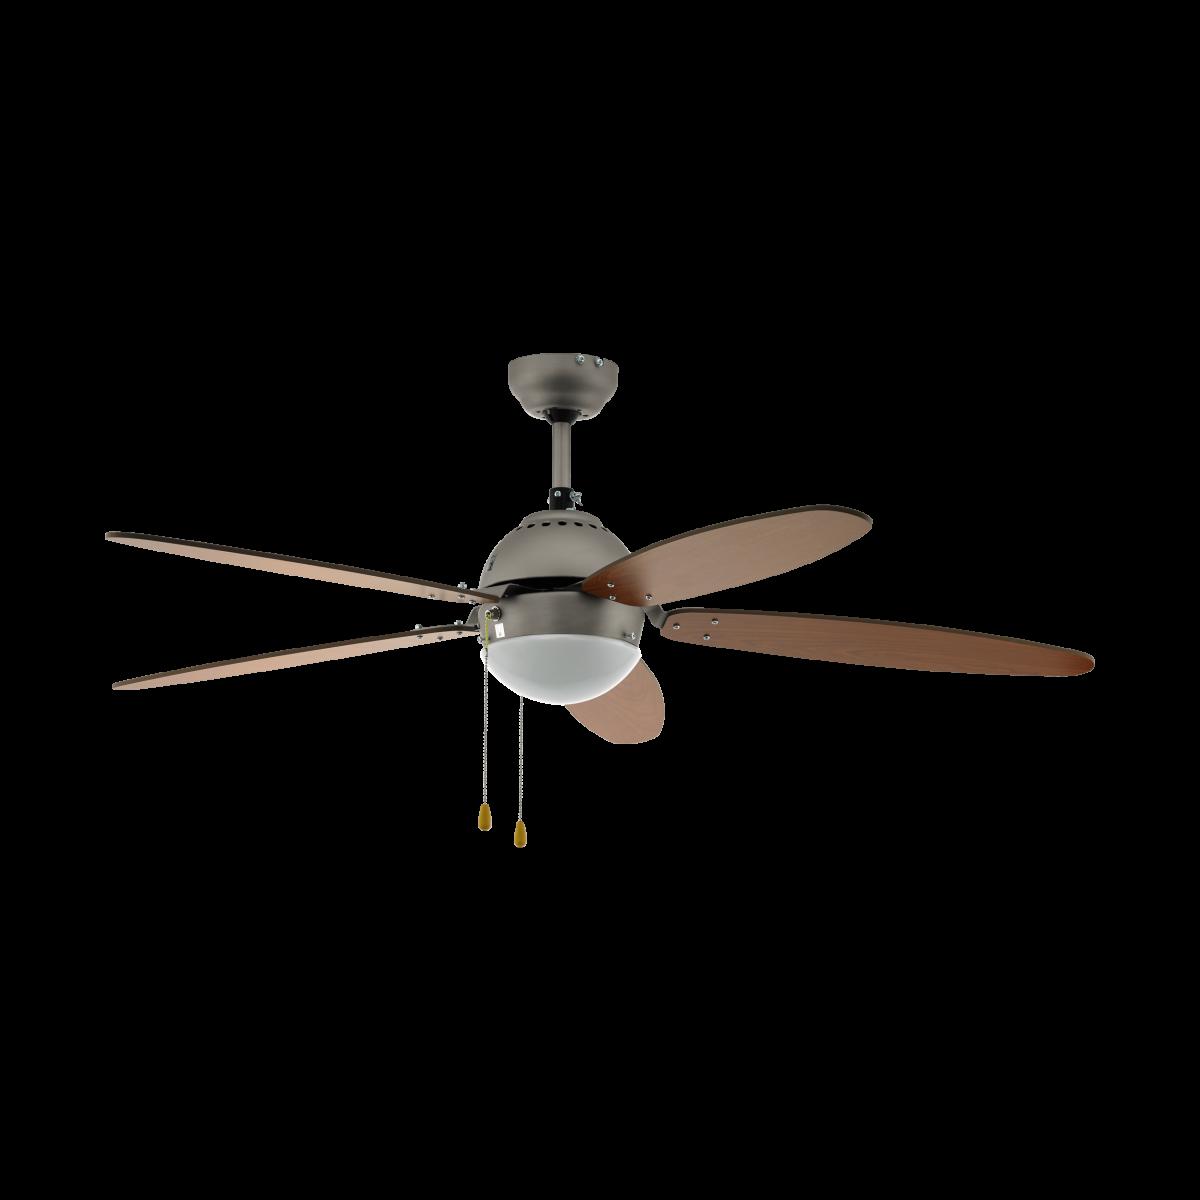 Люстра - вентилятор SUSALE EGLO 35042 - Фото №28